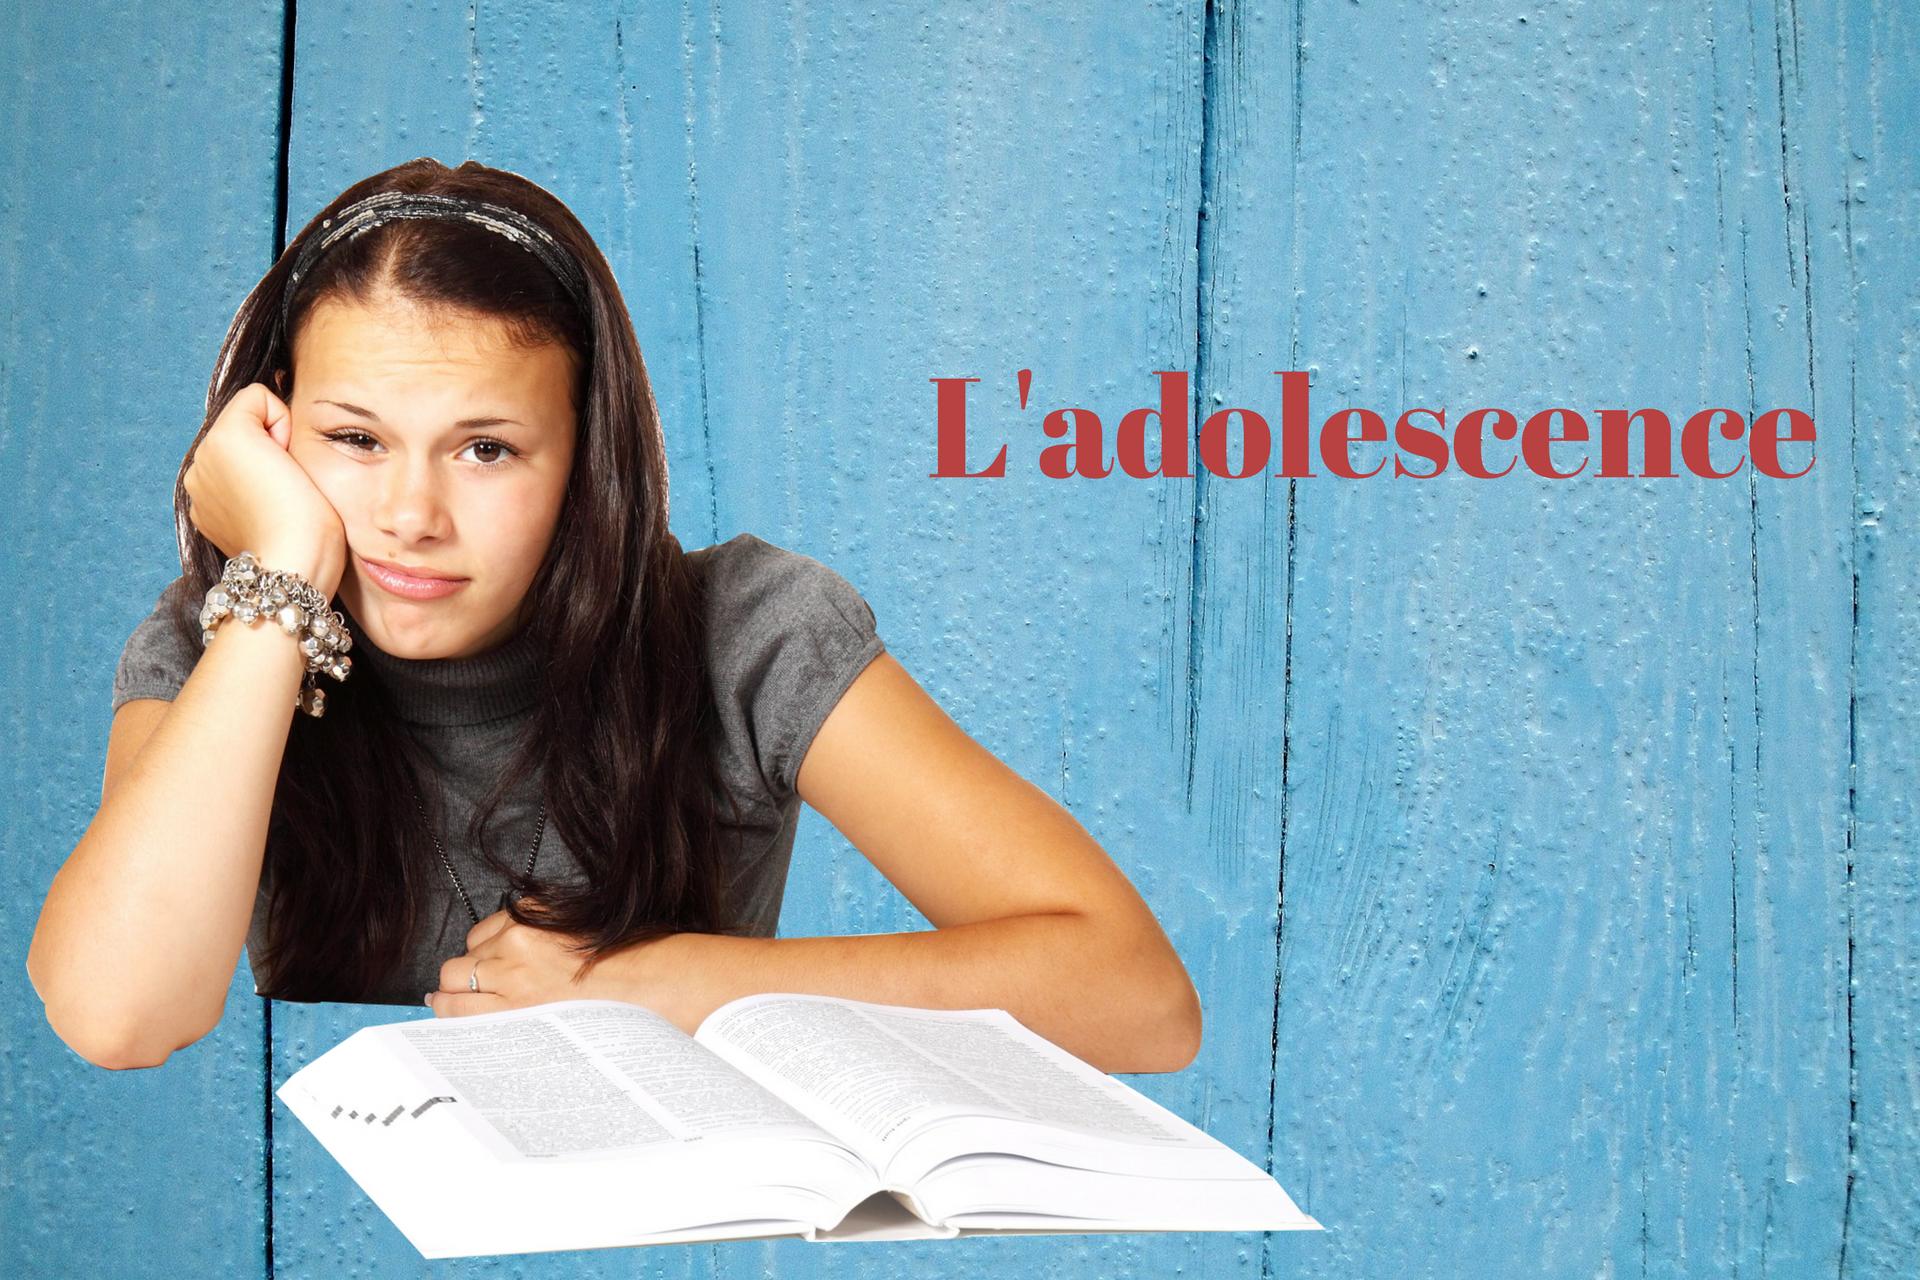 De Lambert Sophie coach L'adolescence